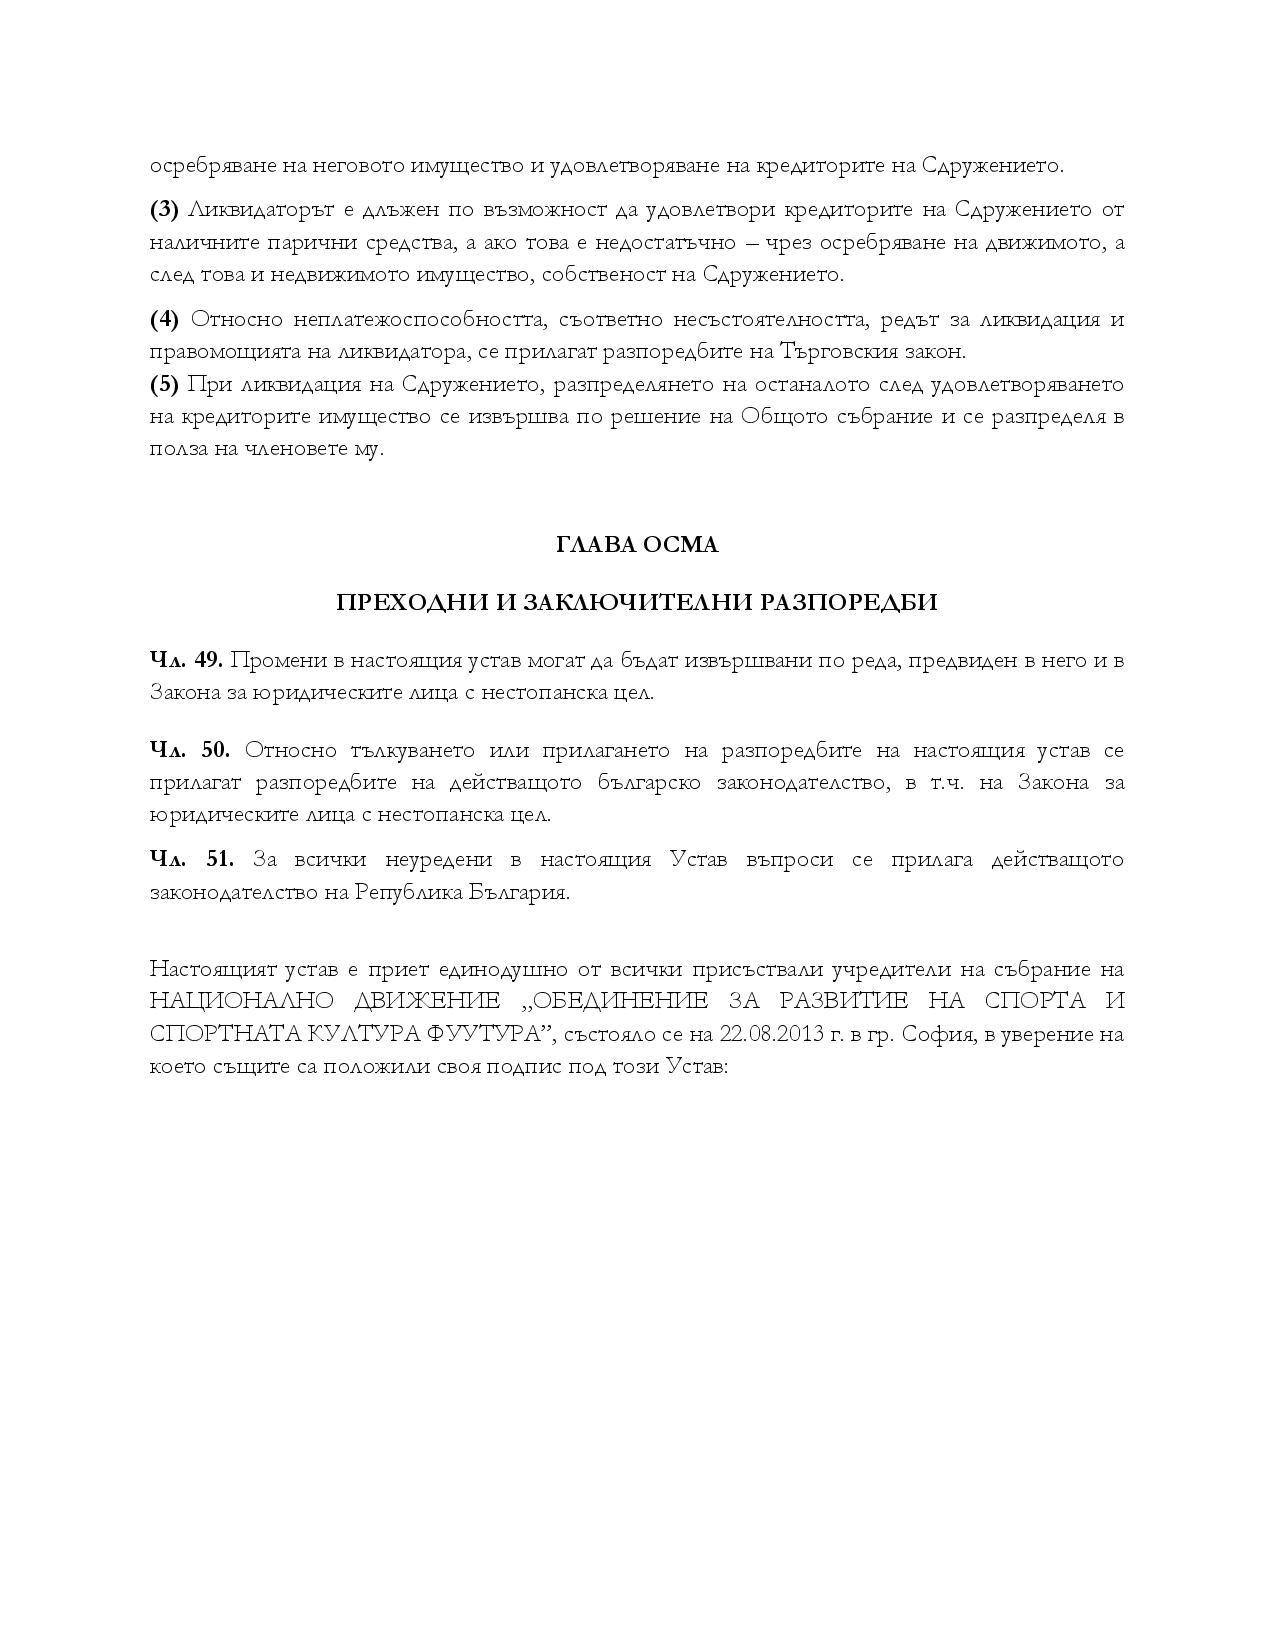 ustav_posl_2014_06_12_20_19_21_743-page-001